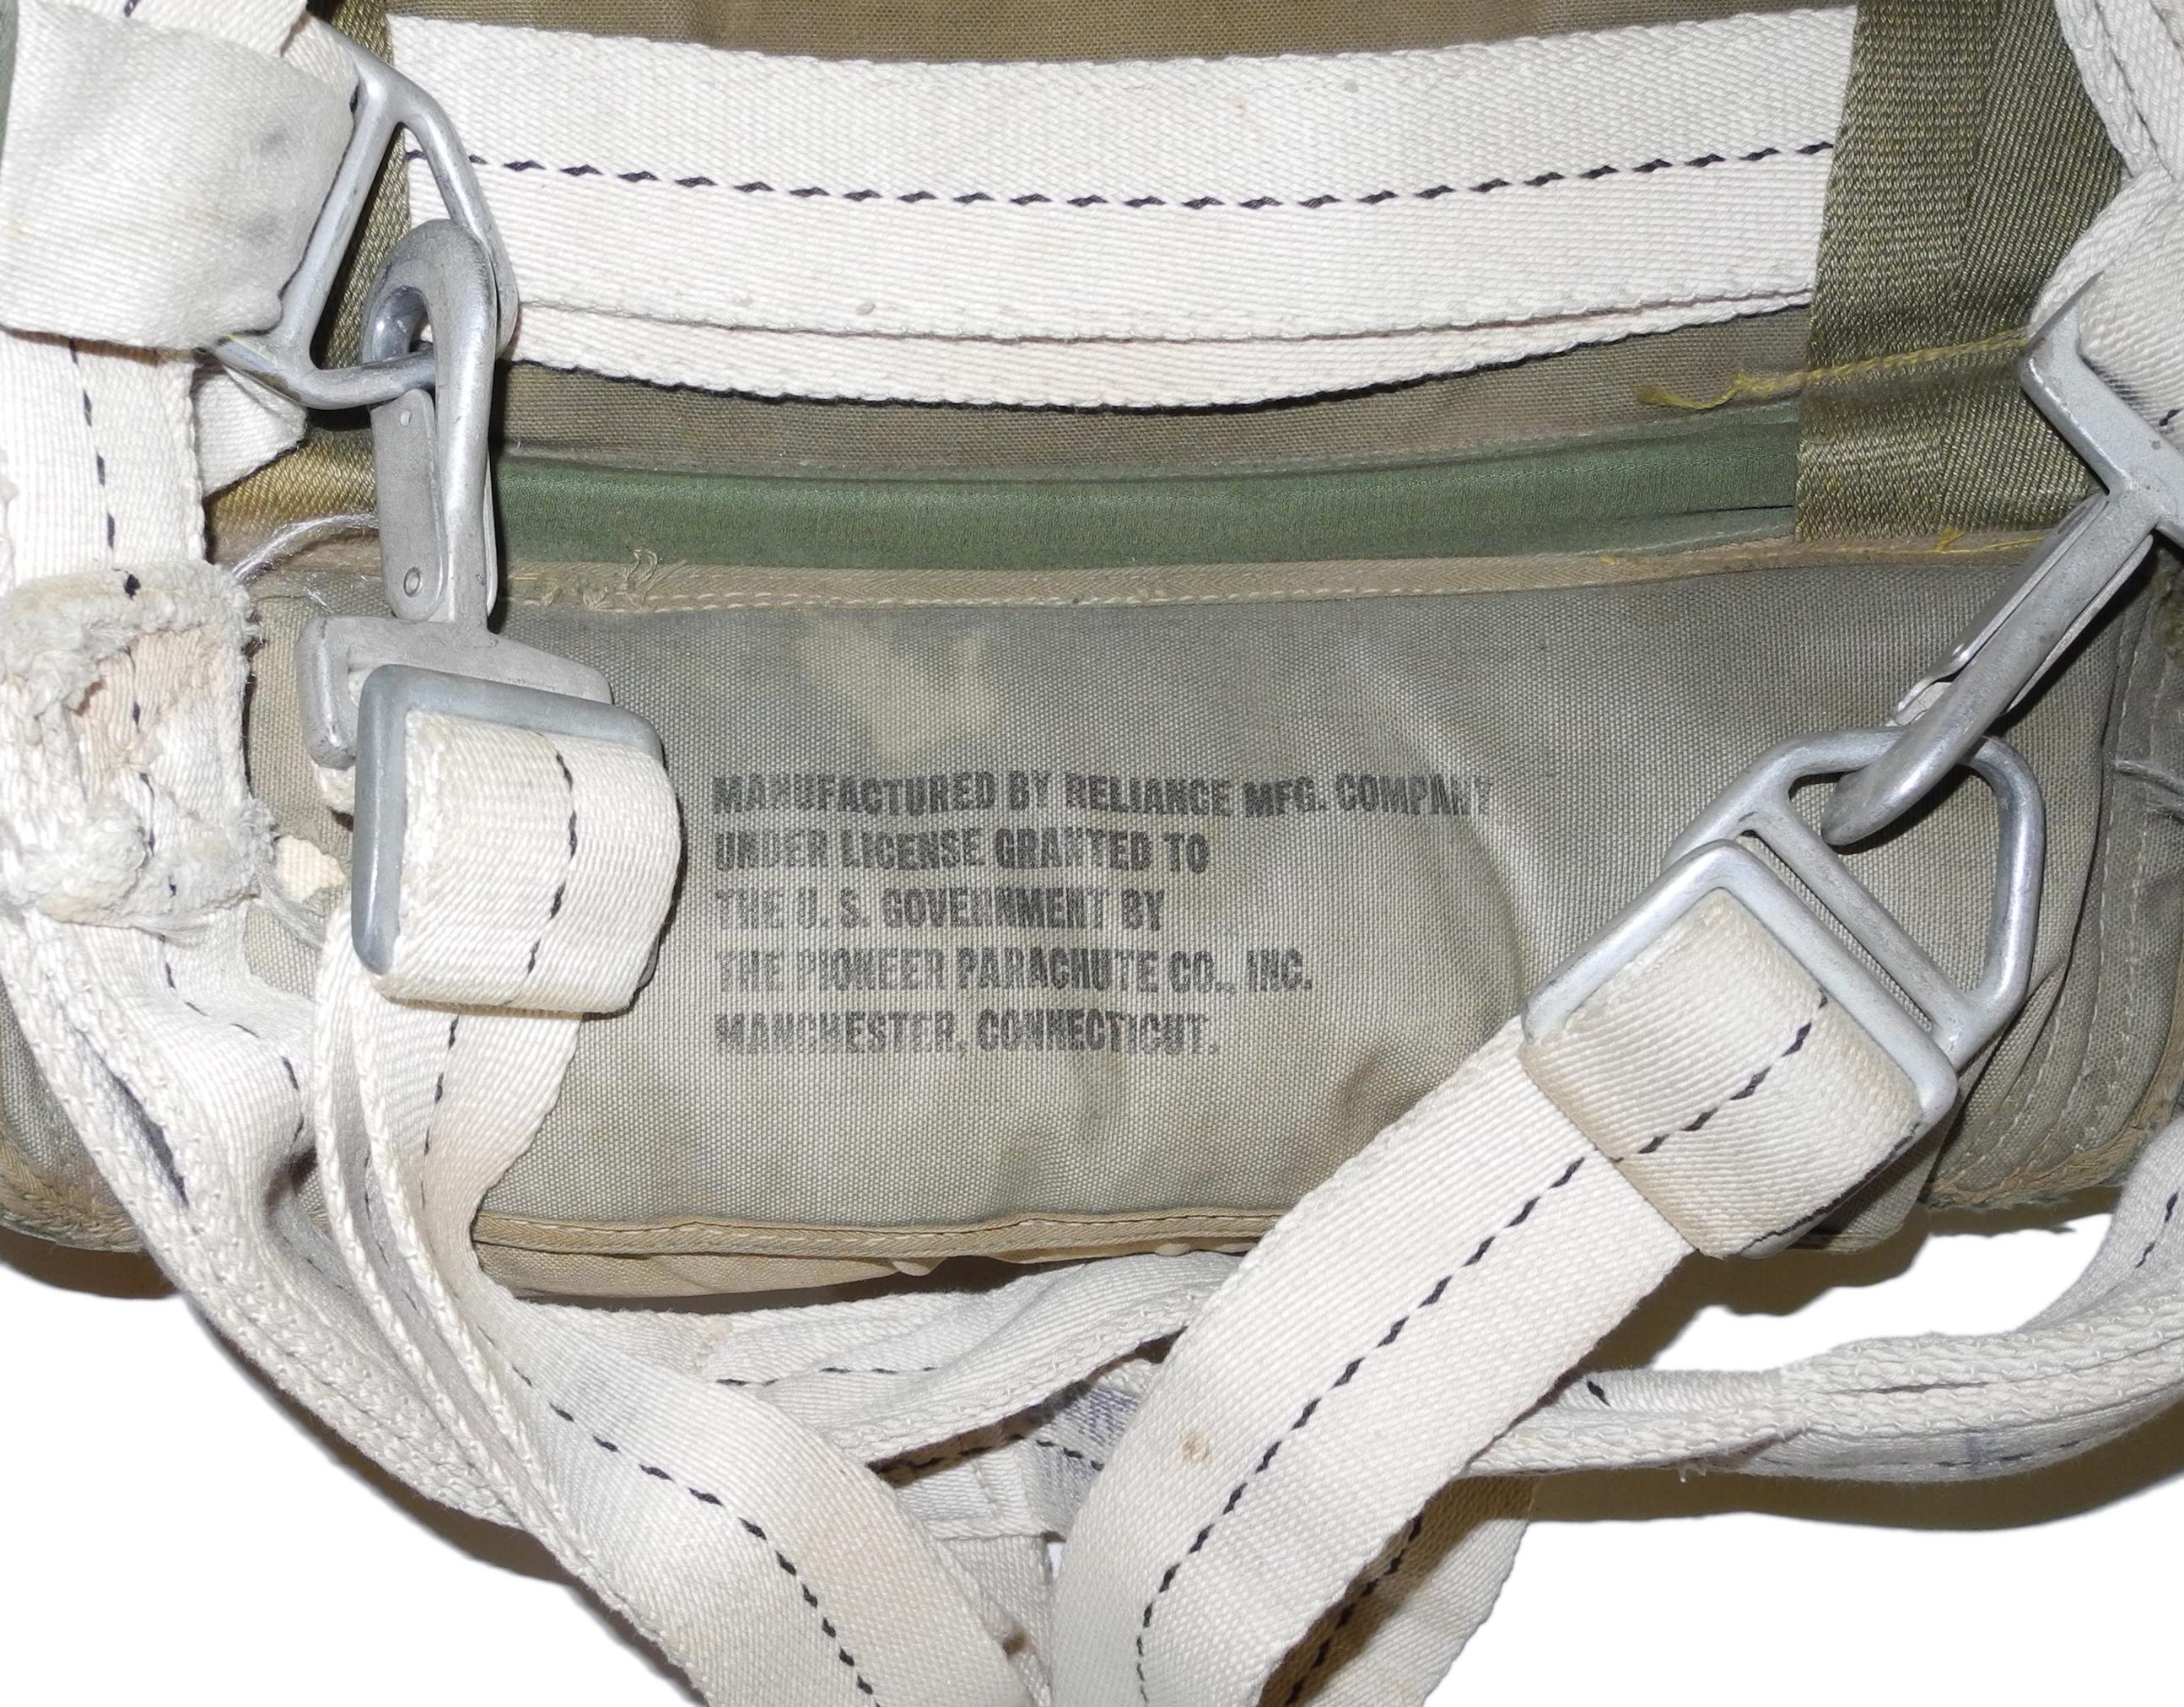 WWII AAF B-8 back parachute